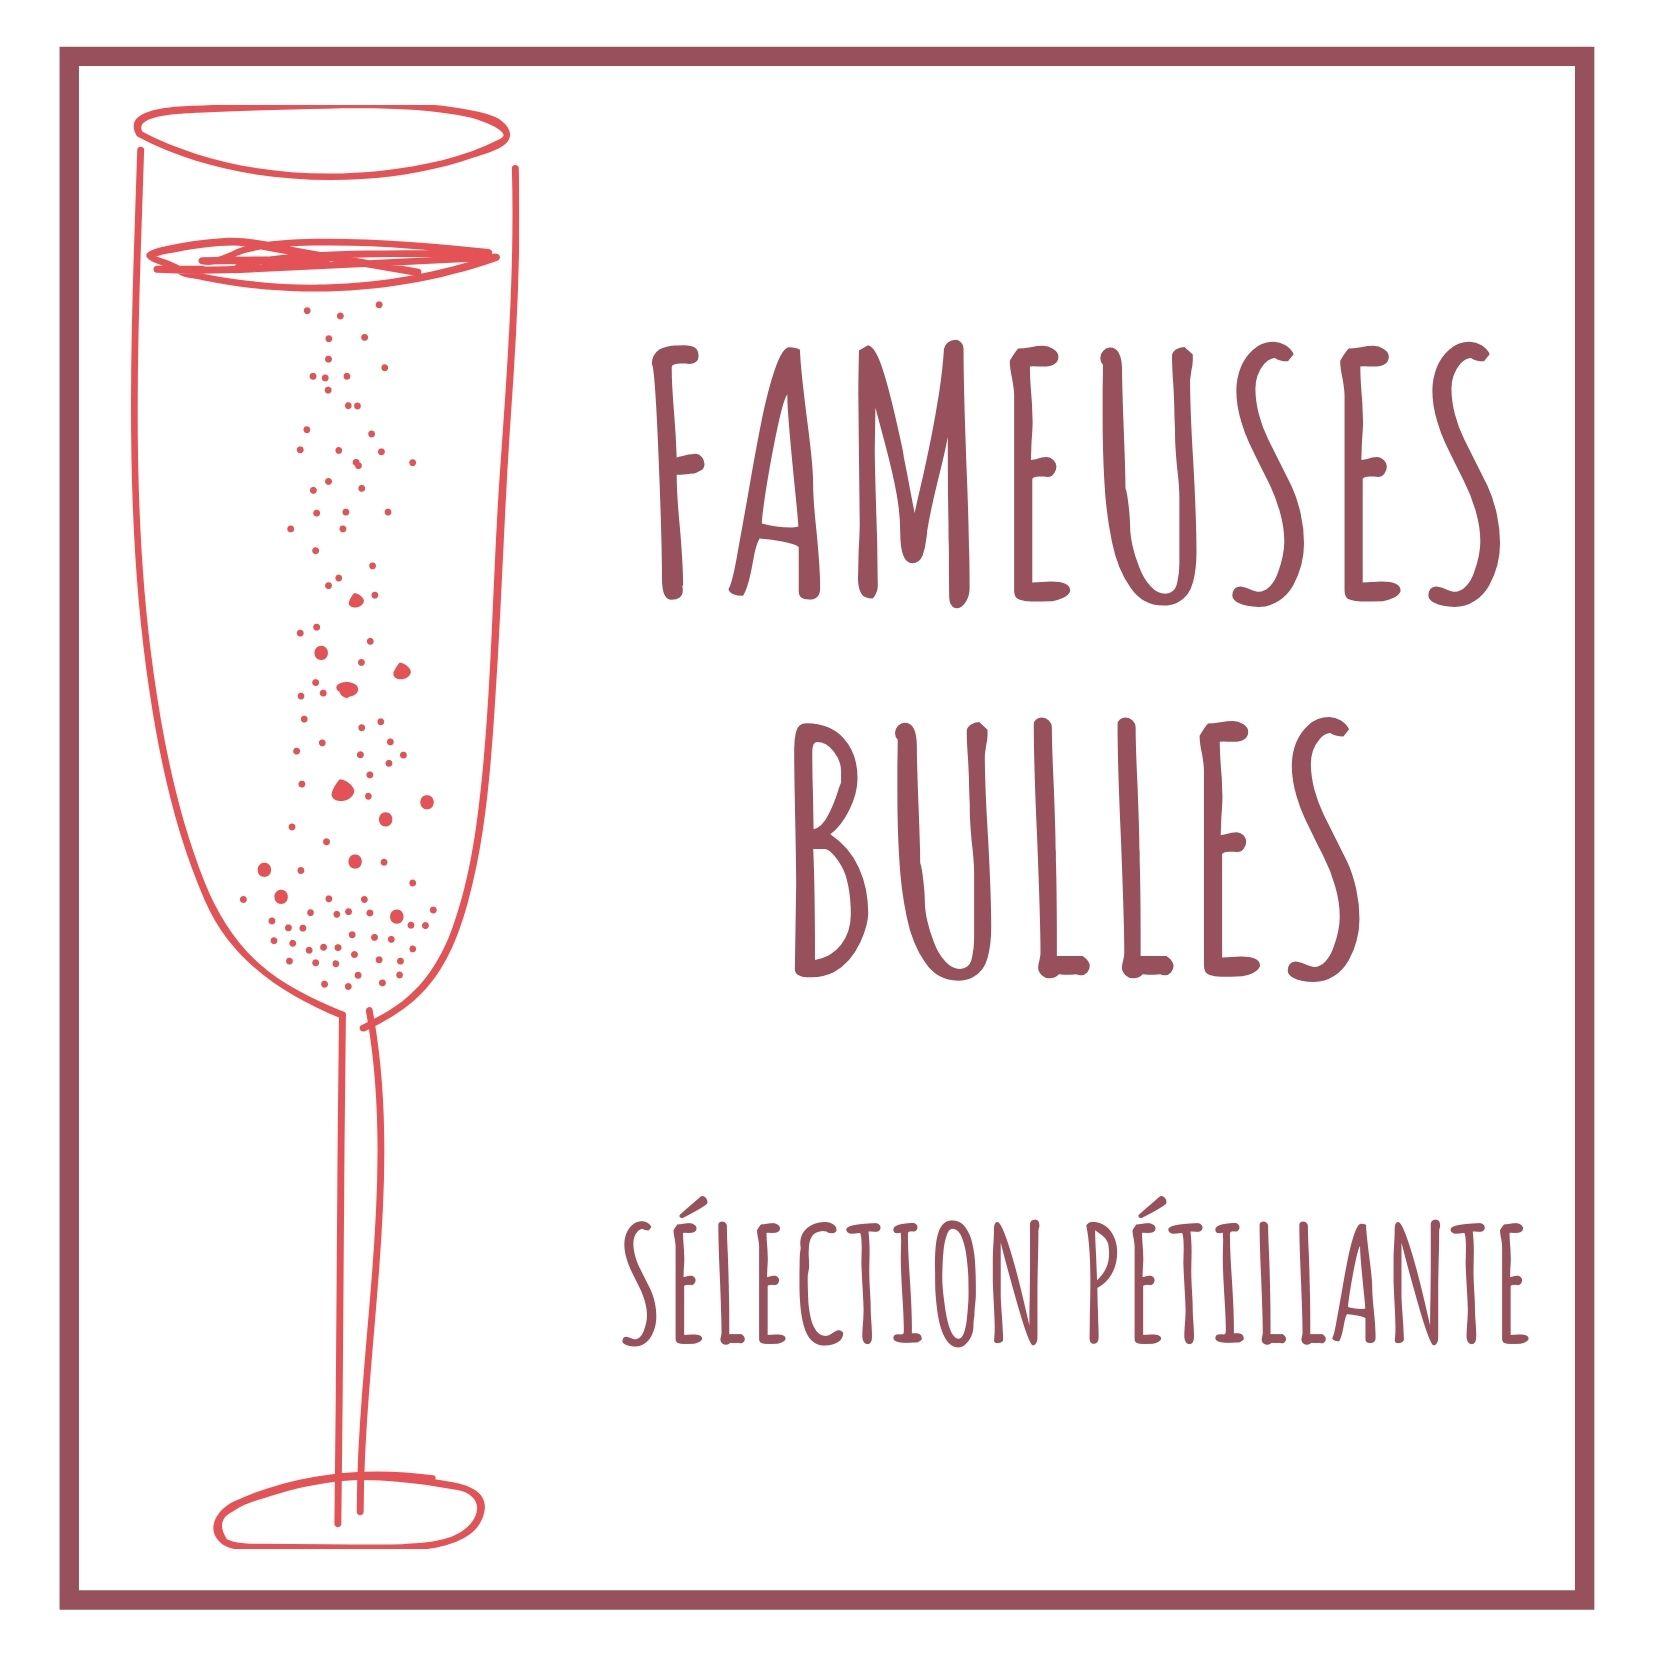 Fameuses bulles Sélection pétillante